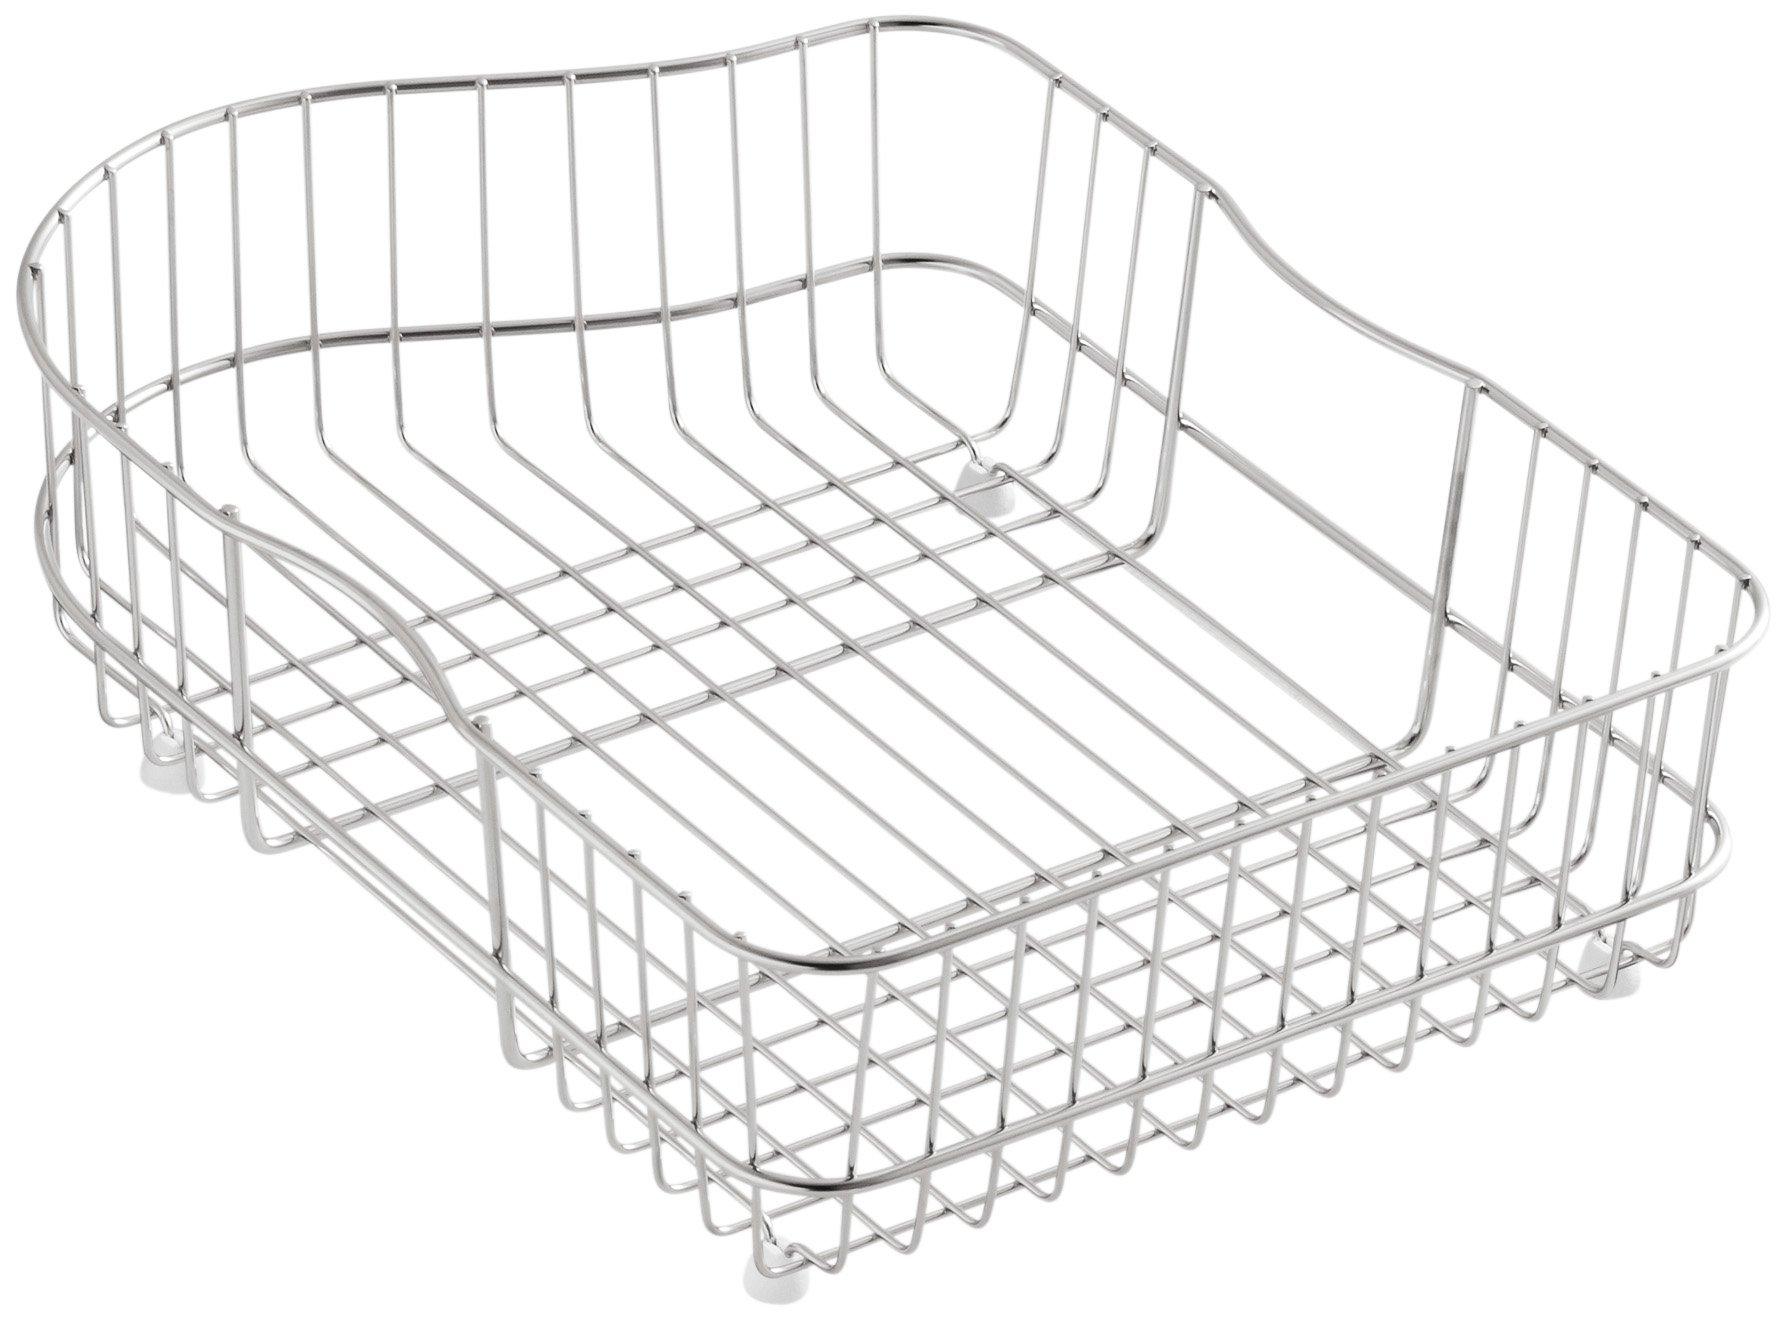 Kohler K-6603L-ST Hartland Wire Rinse Basket, Stainless Steel